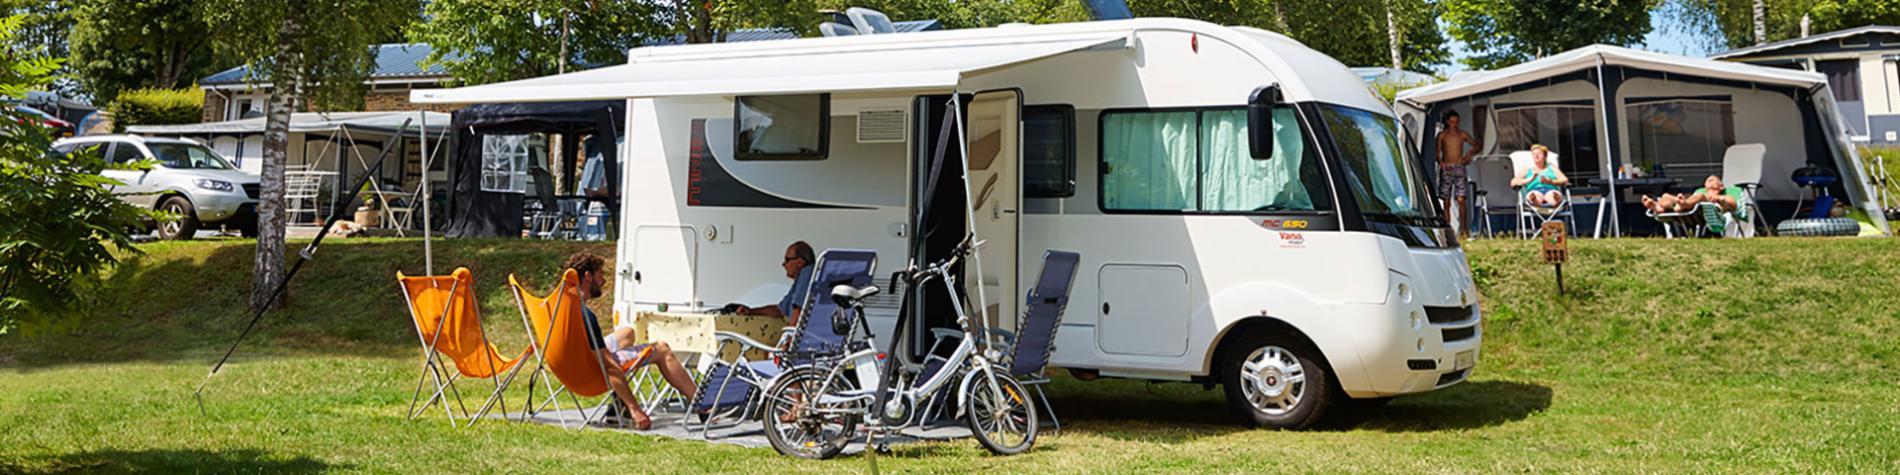 camping en Wallonie - camp - campement - bivouac - aire touristique - nature - Ardennen Camping Bertrix - Camping en Wallonie